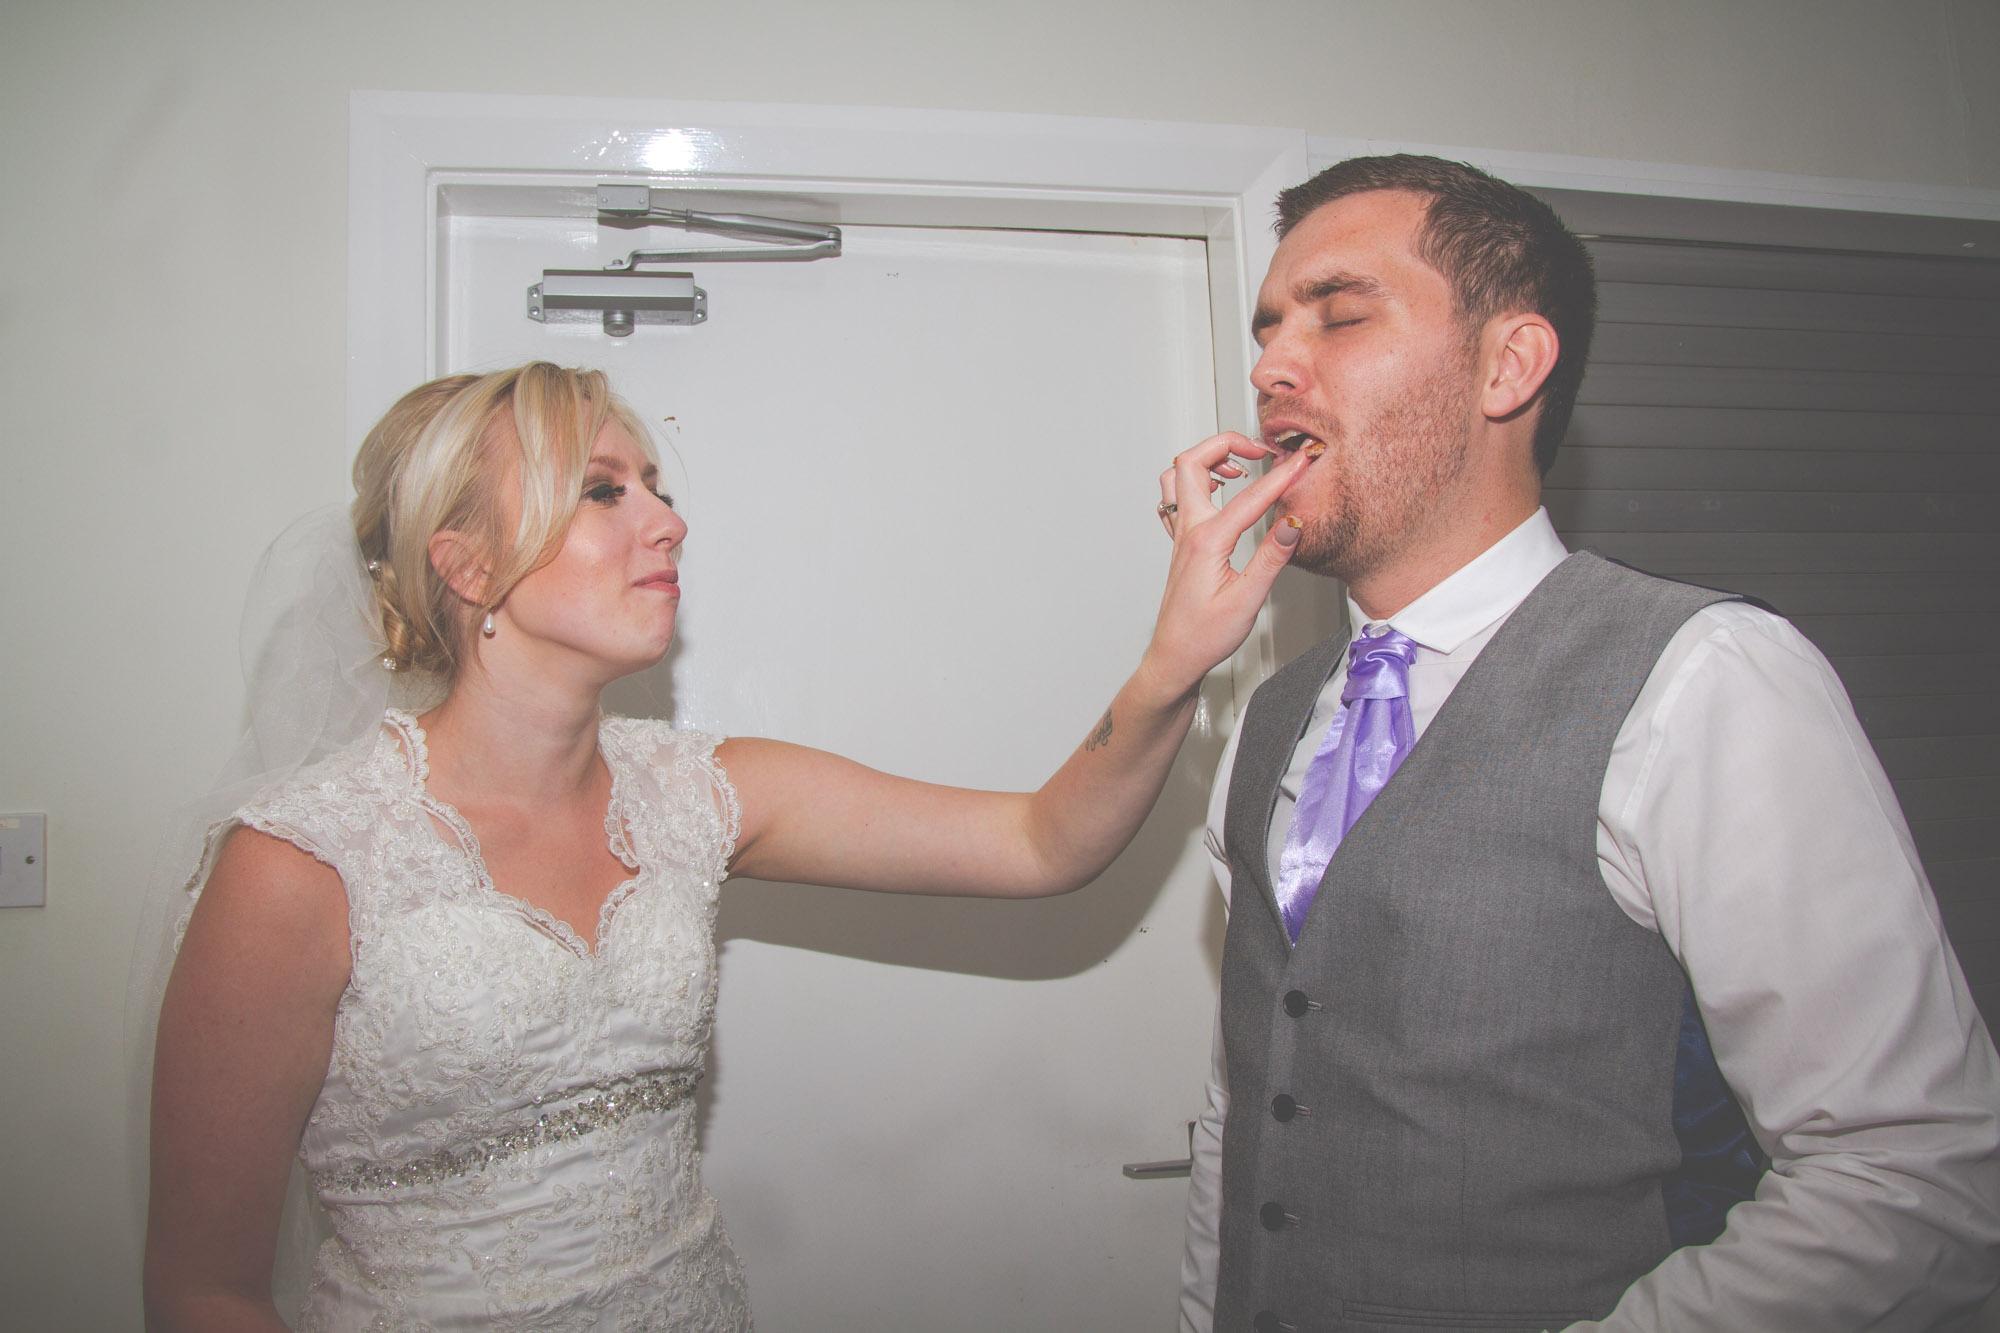 skipton-registry-office-wedding-photography-59.jpg